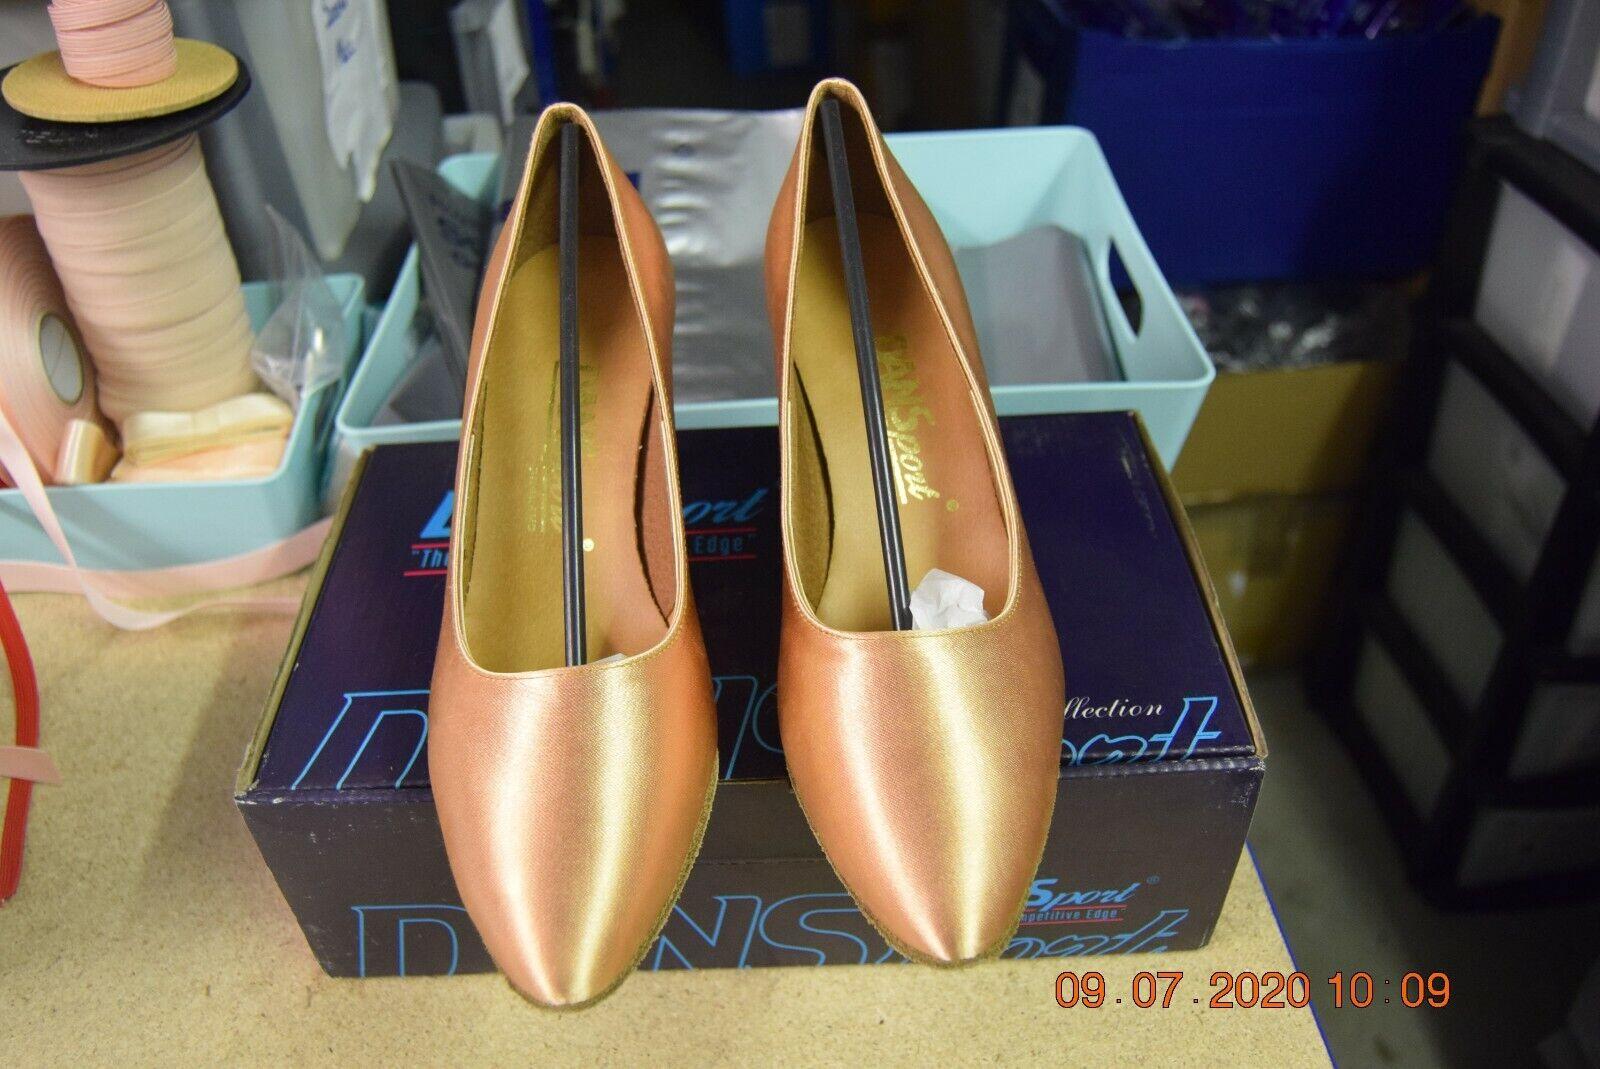 Flesh satin Dansport C2001 ballroom latin dance shoes - size UK 7.5